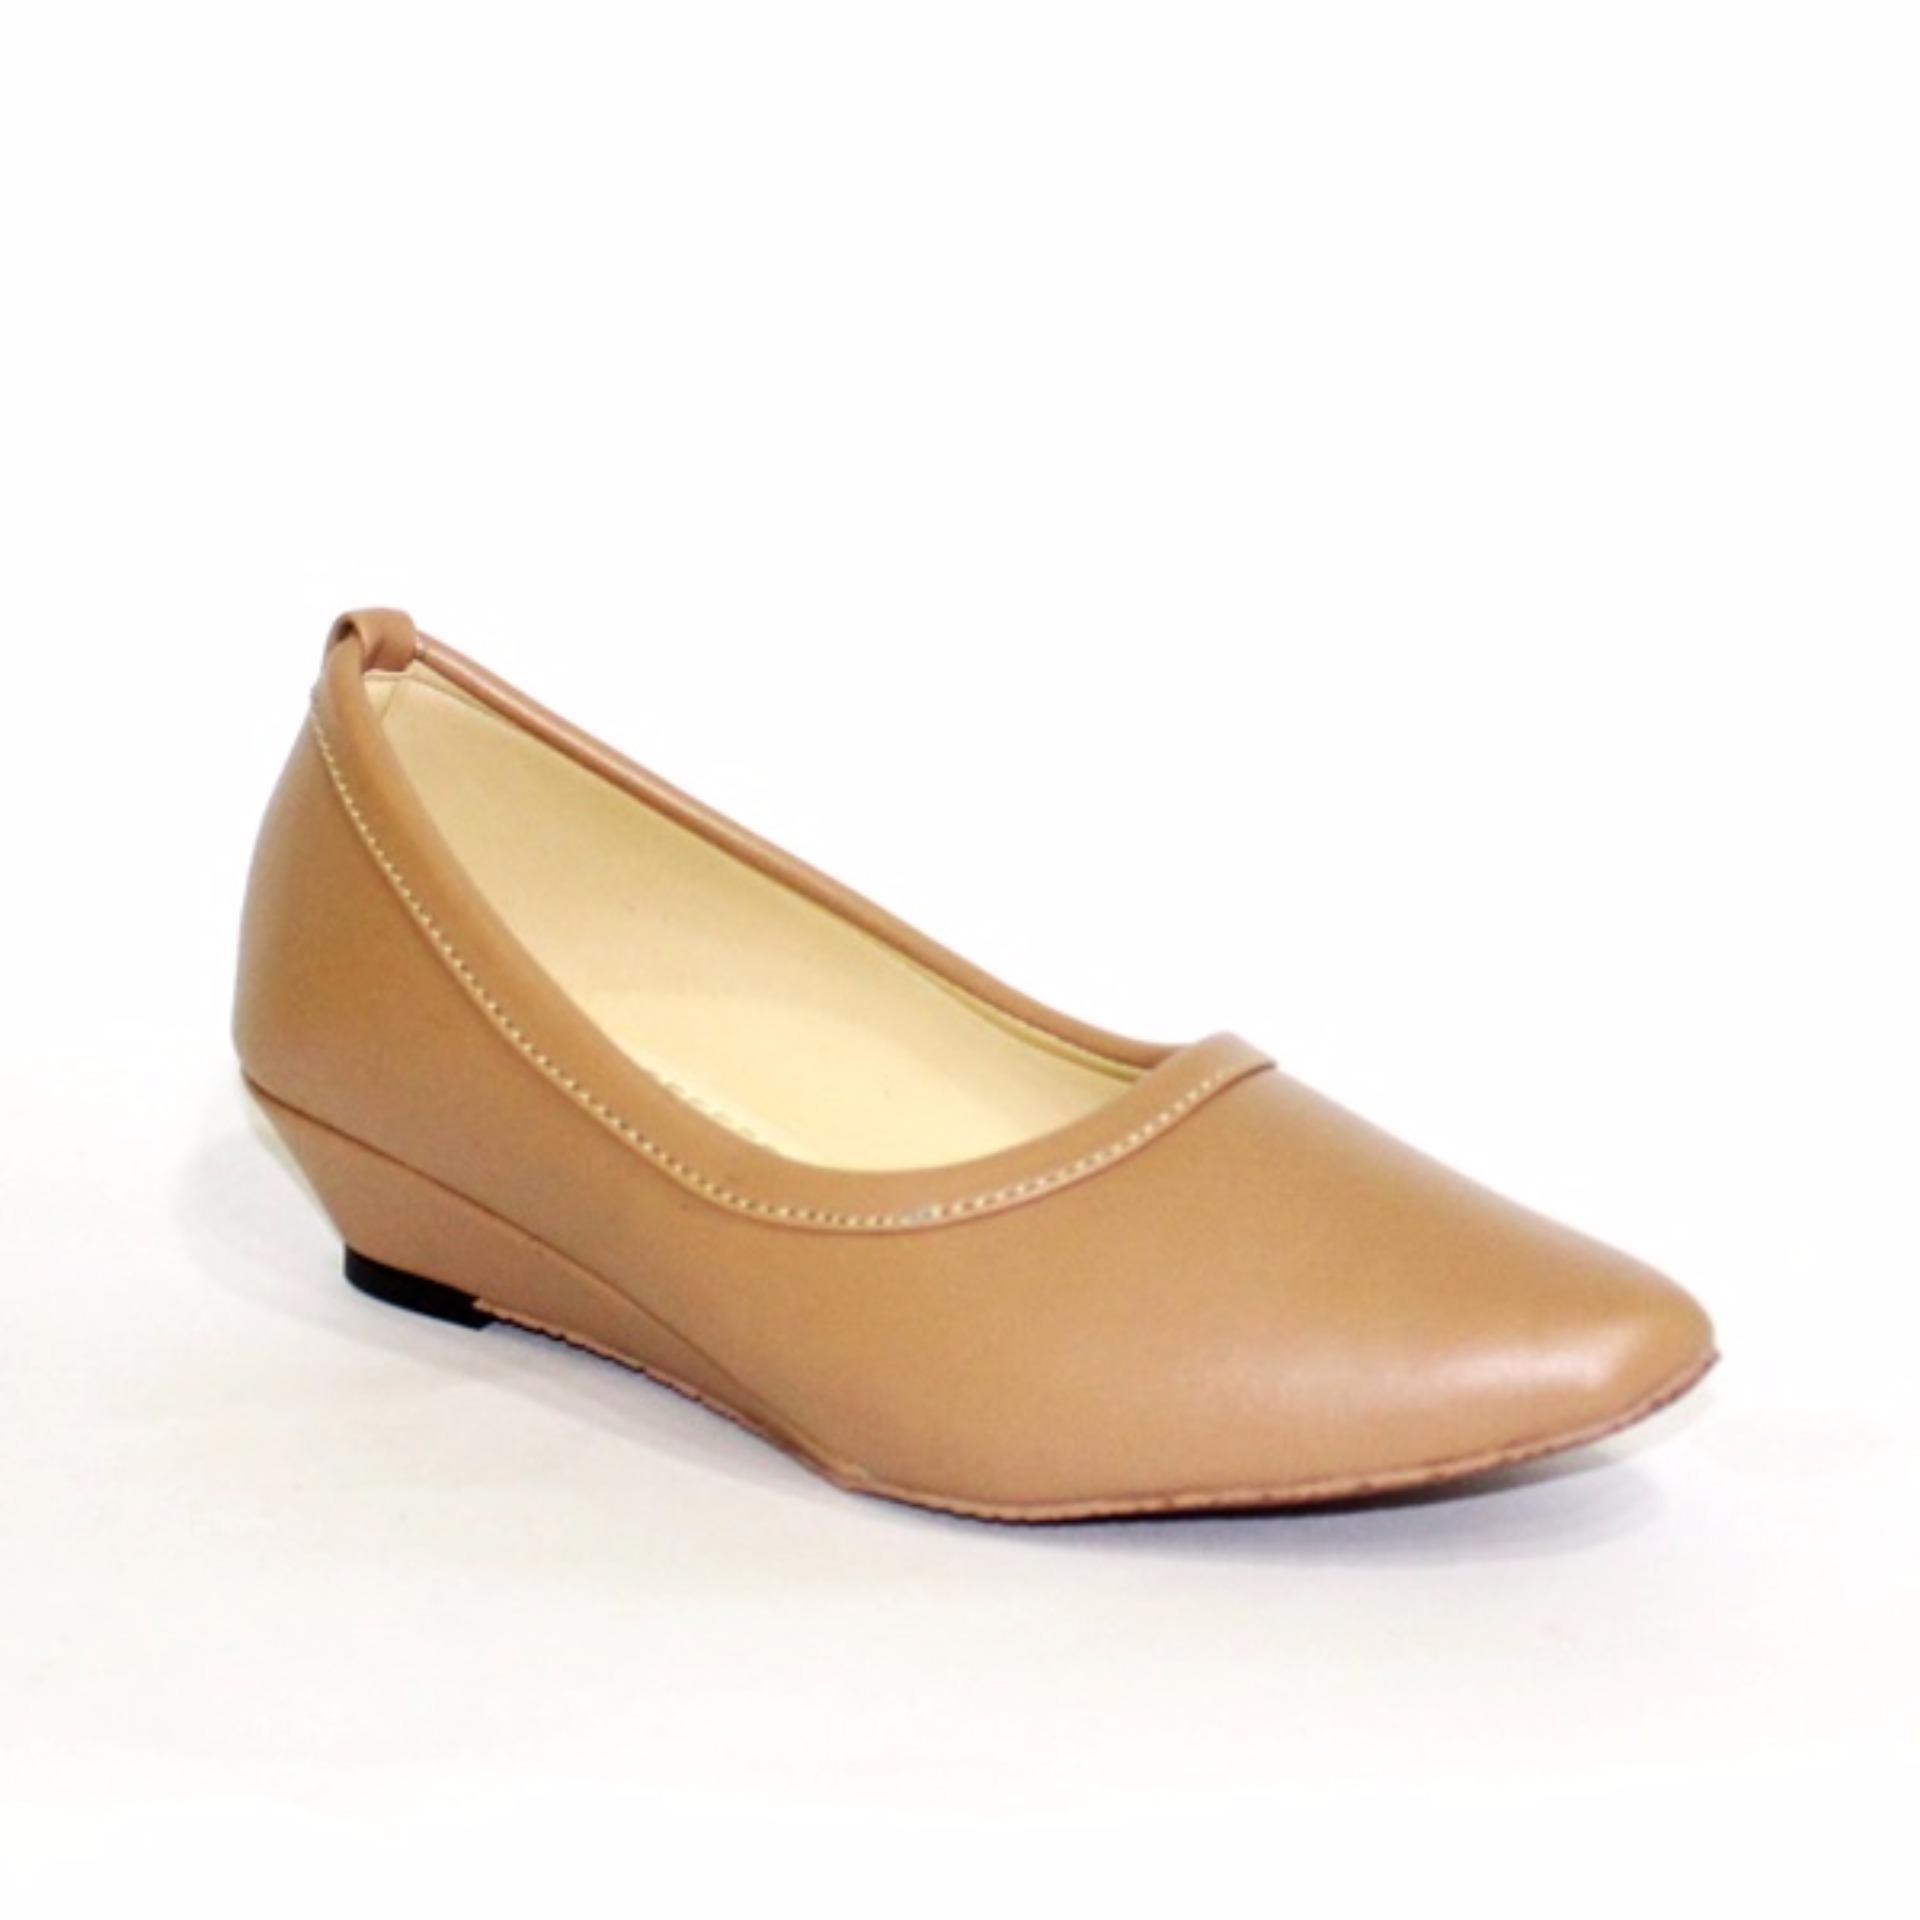 Unik Sepatu Kets Slip on Wanita Anyam Square 55 Hitam Krem Pink BS Limited. Source